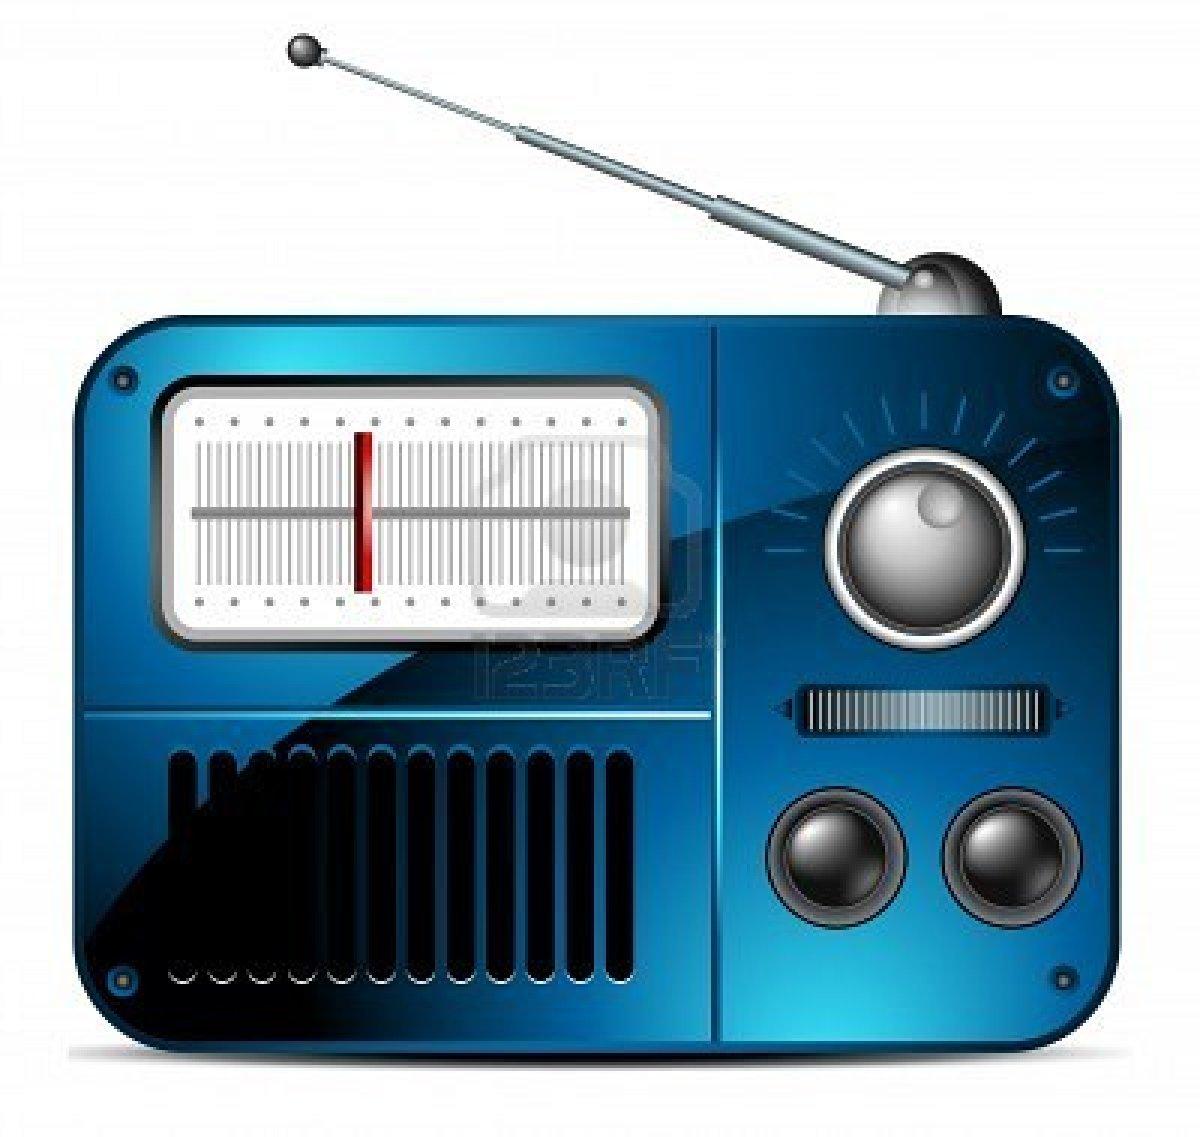 Radio Fm Save Png #17102.